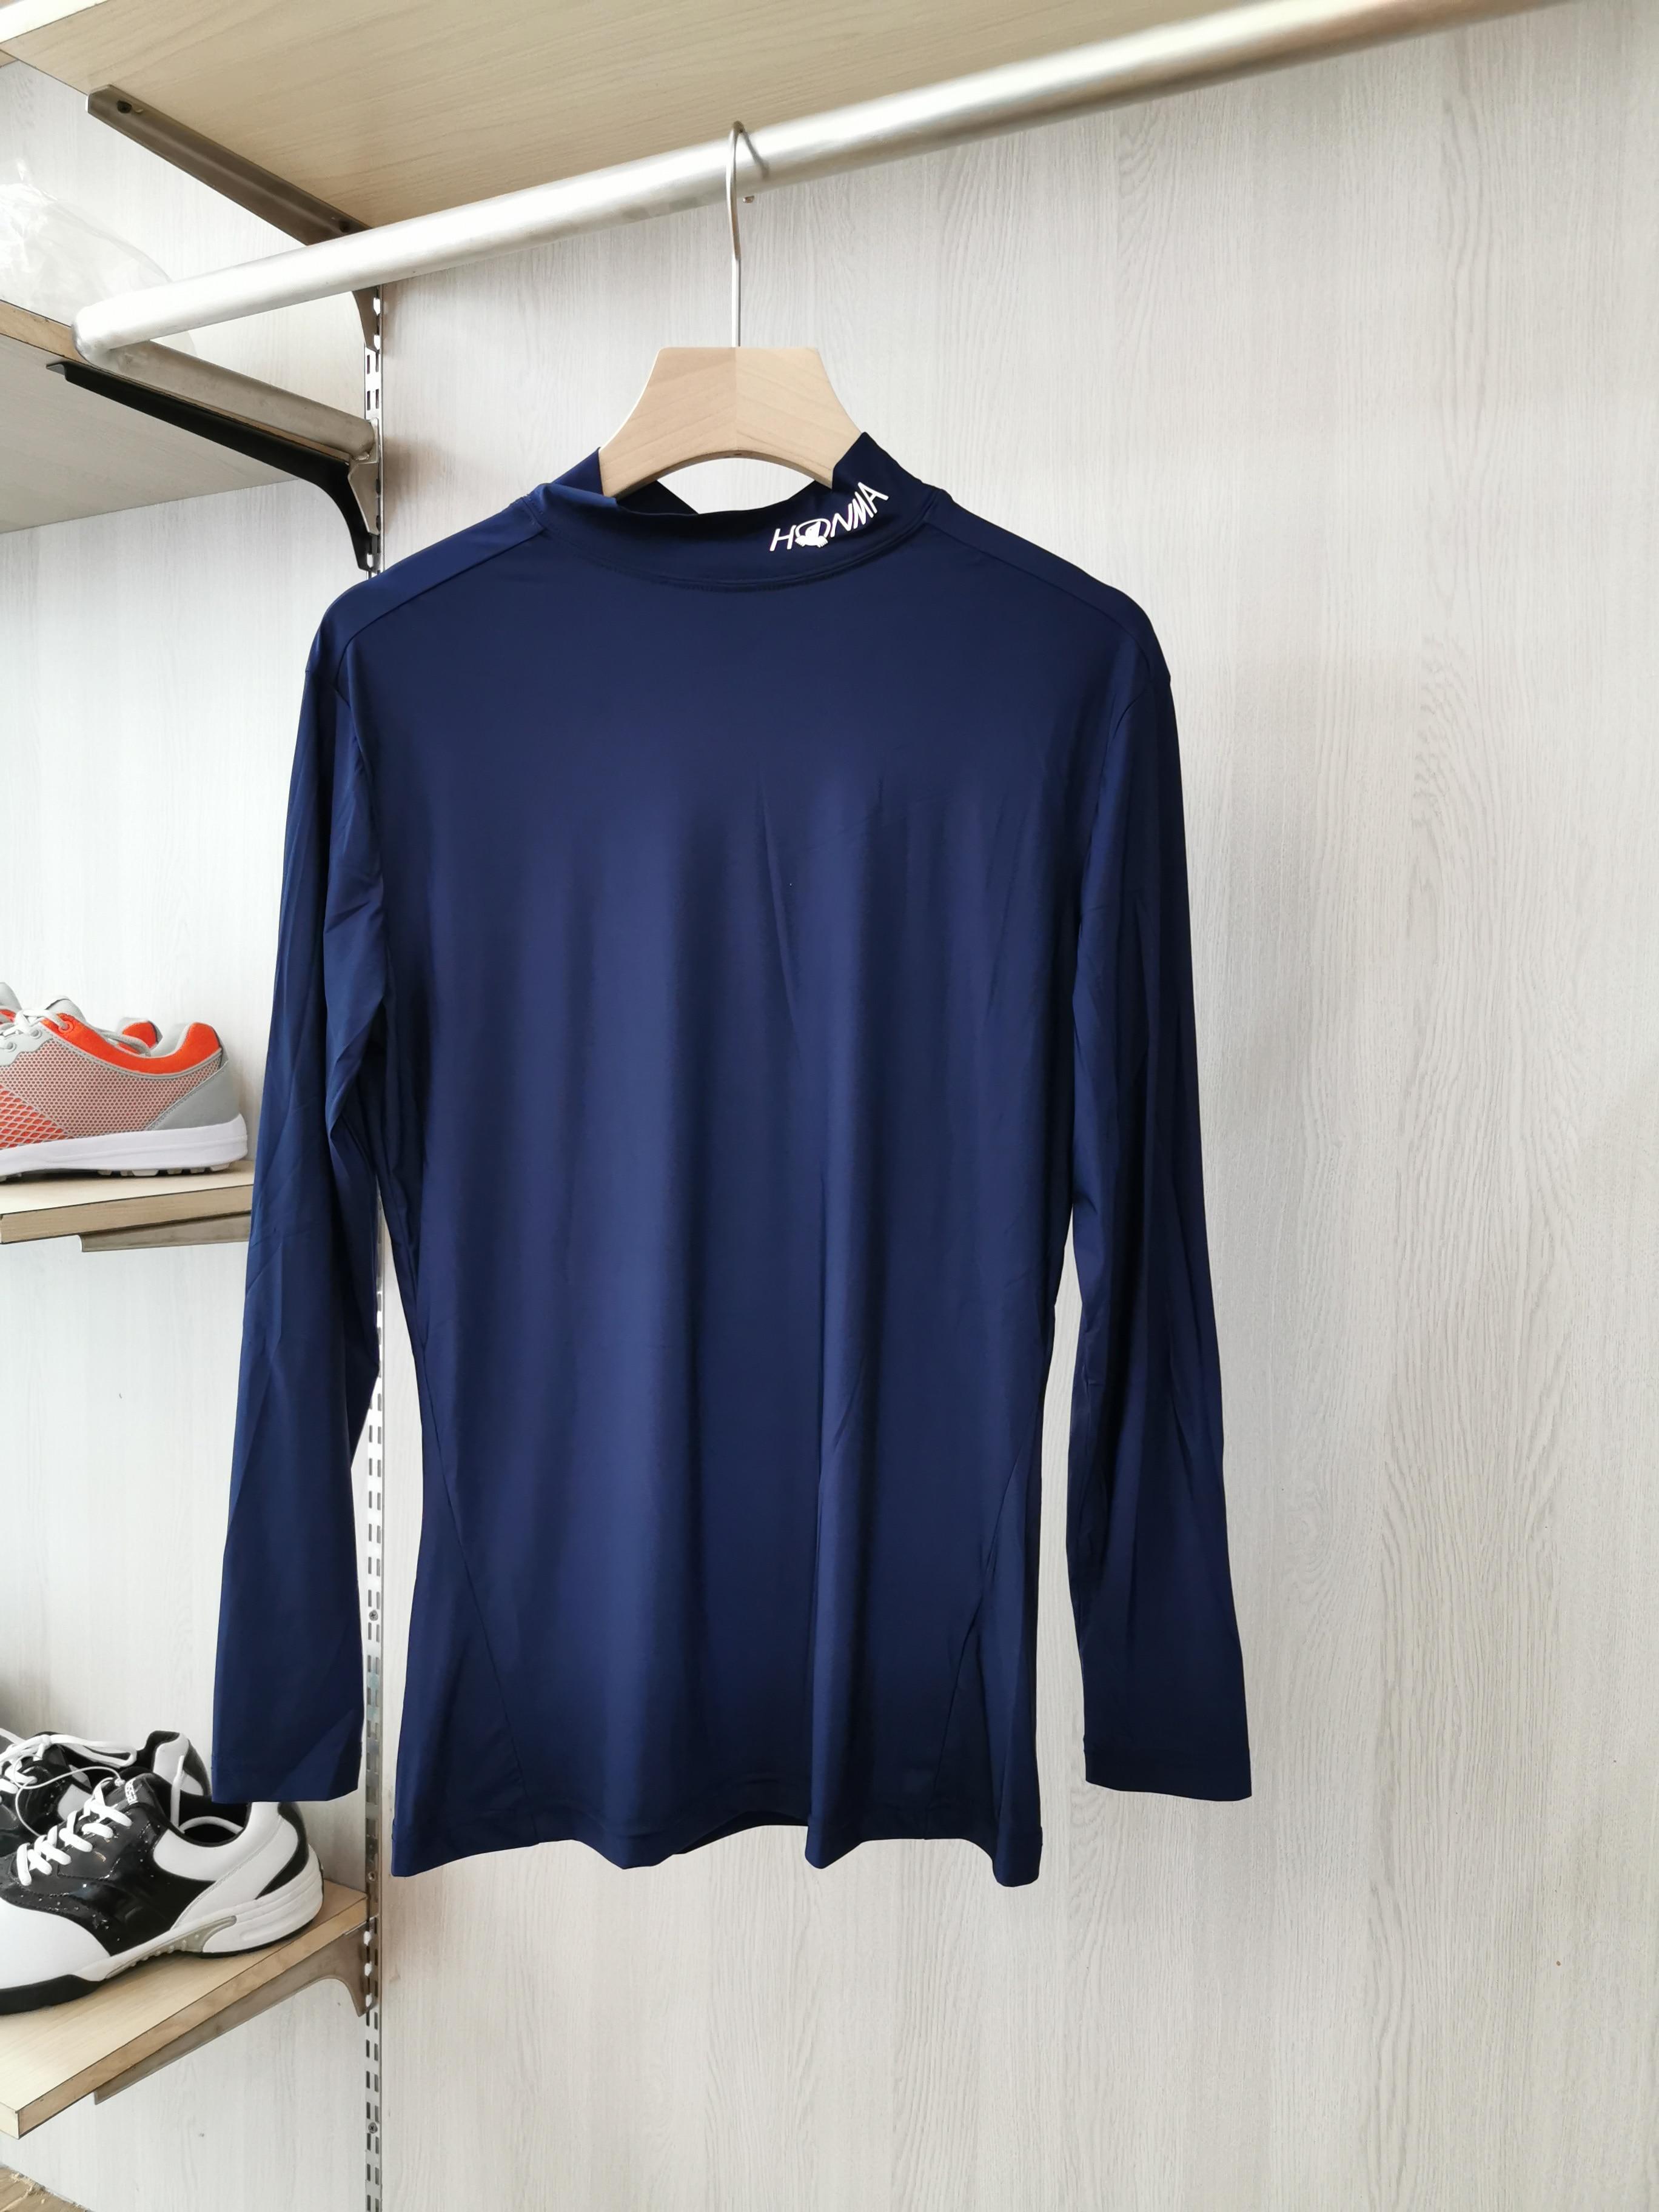 Golfer's Undercoat, Ice Silk, Sun Block, Long Sleeves